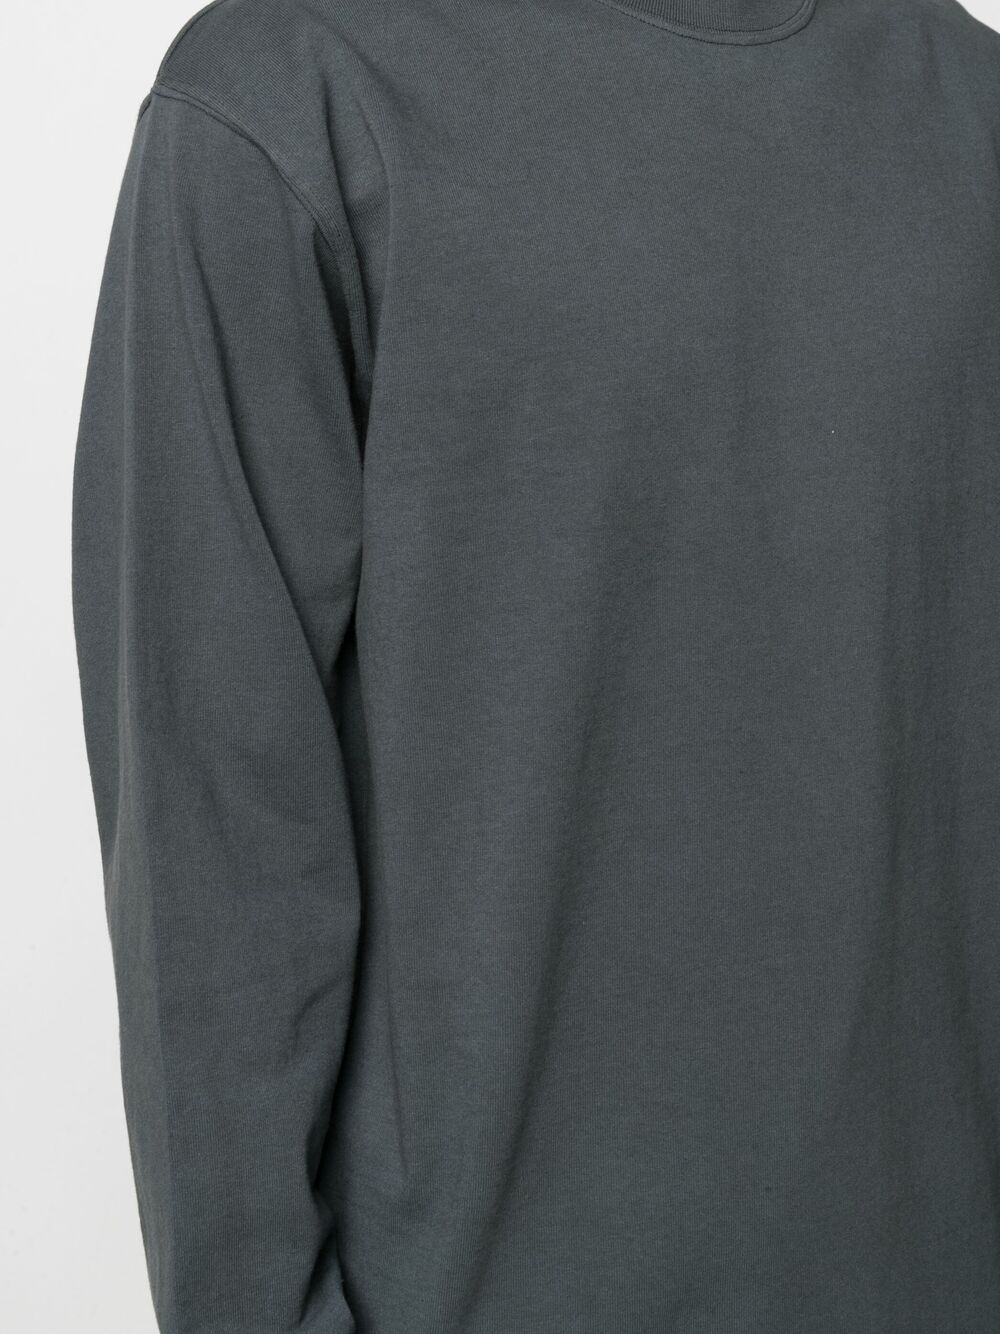 Gr10K felpa a girocollo uomo grigio anthracite GR10K   T-shirt   GR016ANTRACITE